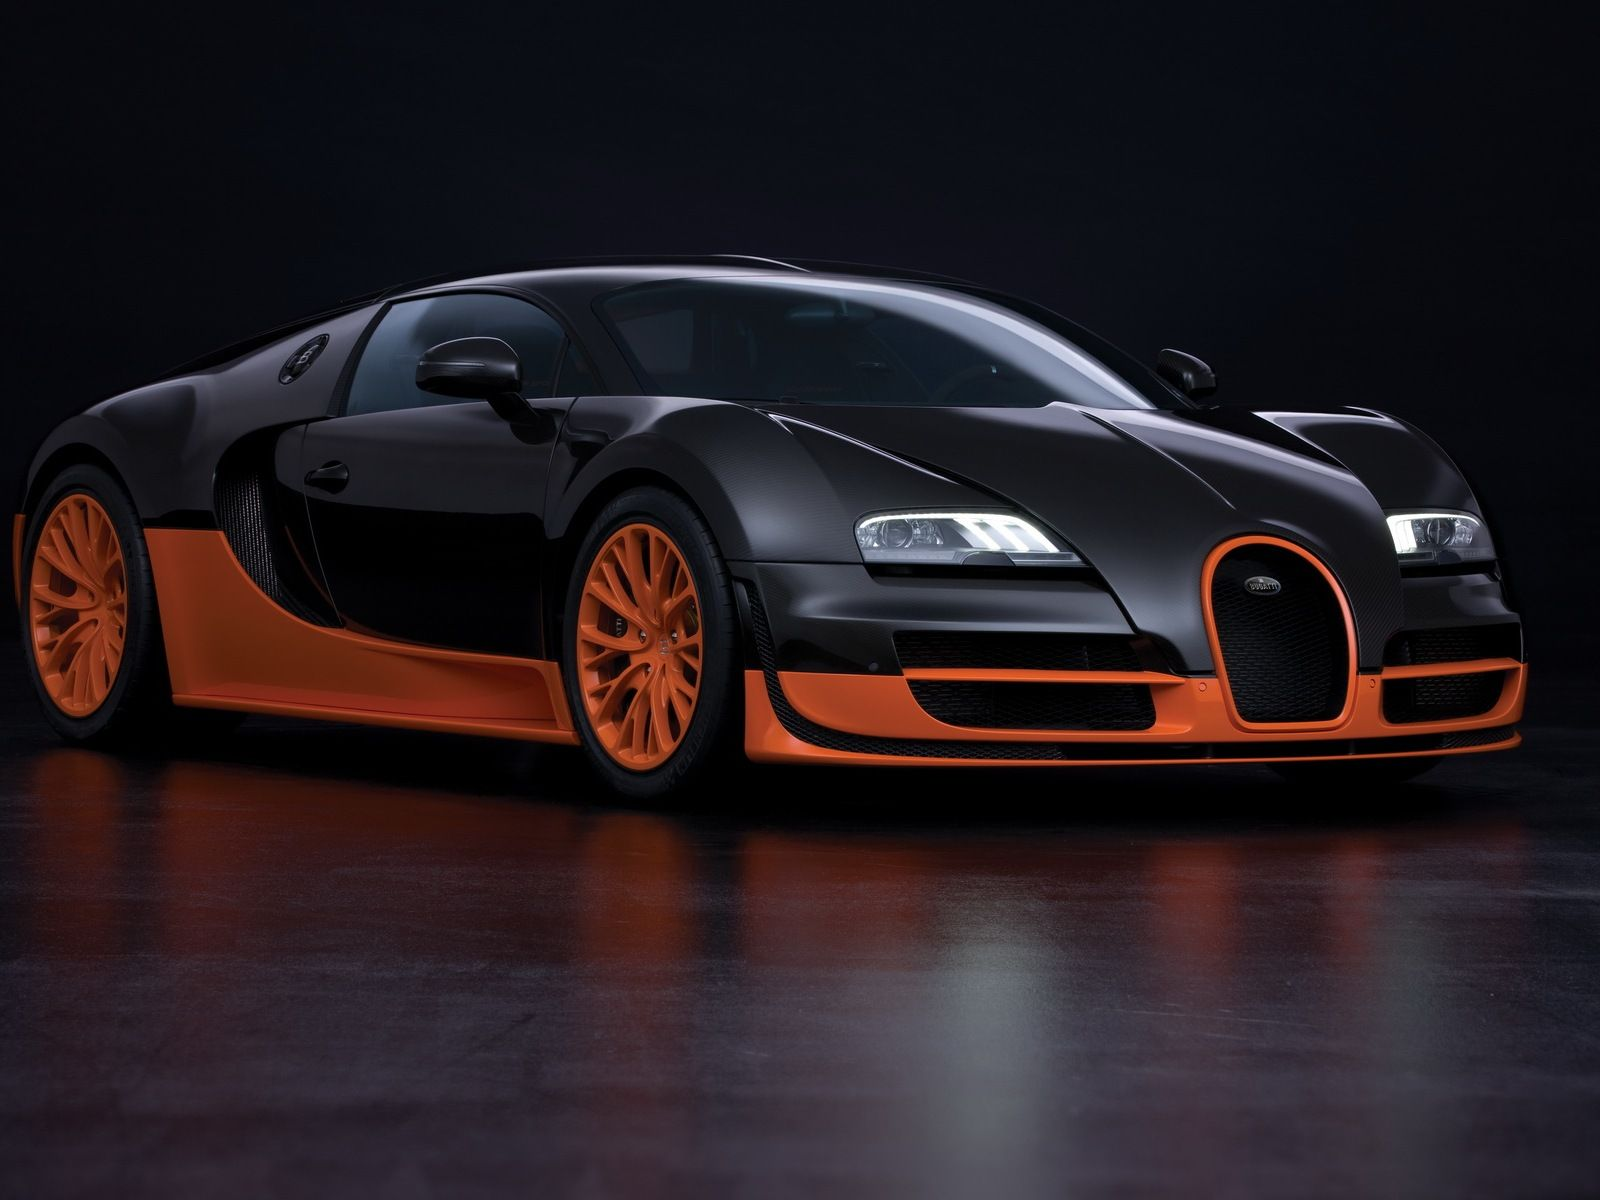 Bugatti Veyron 16.4 Super Sport 1